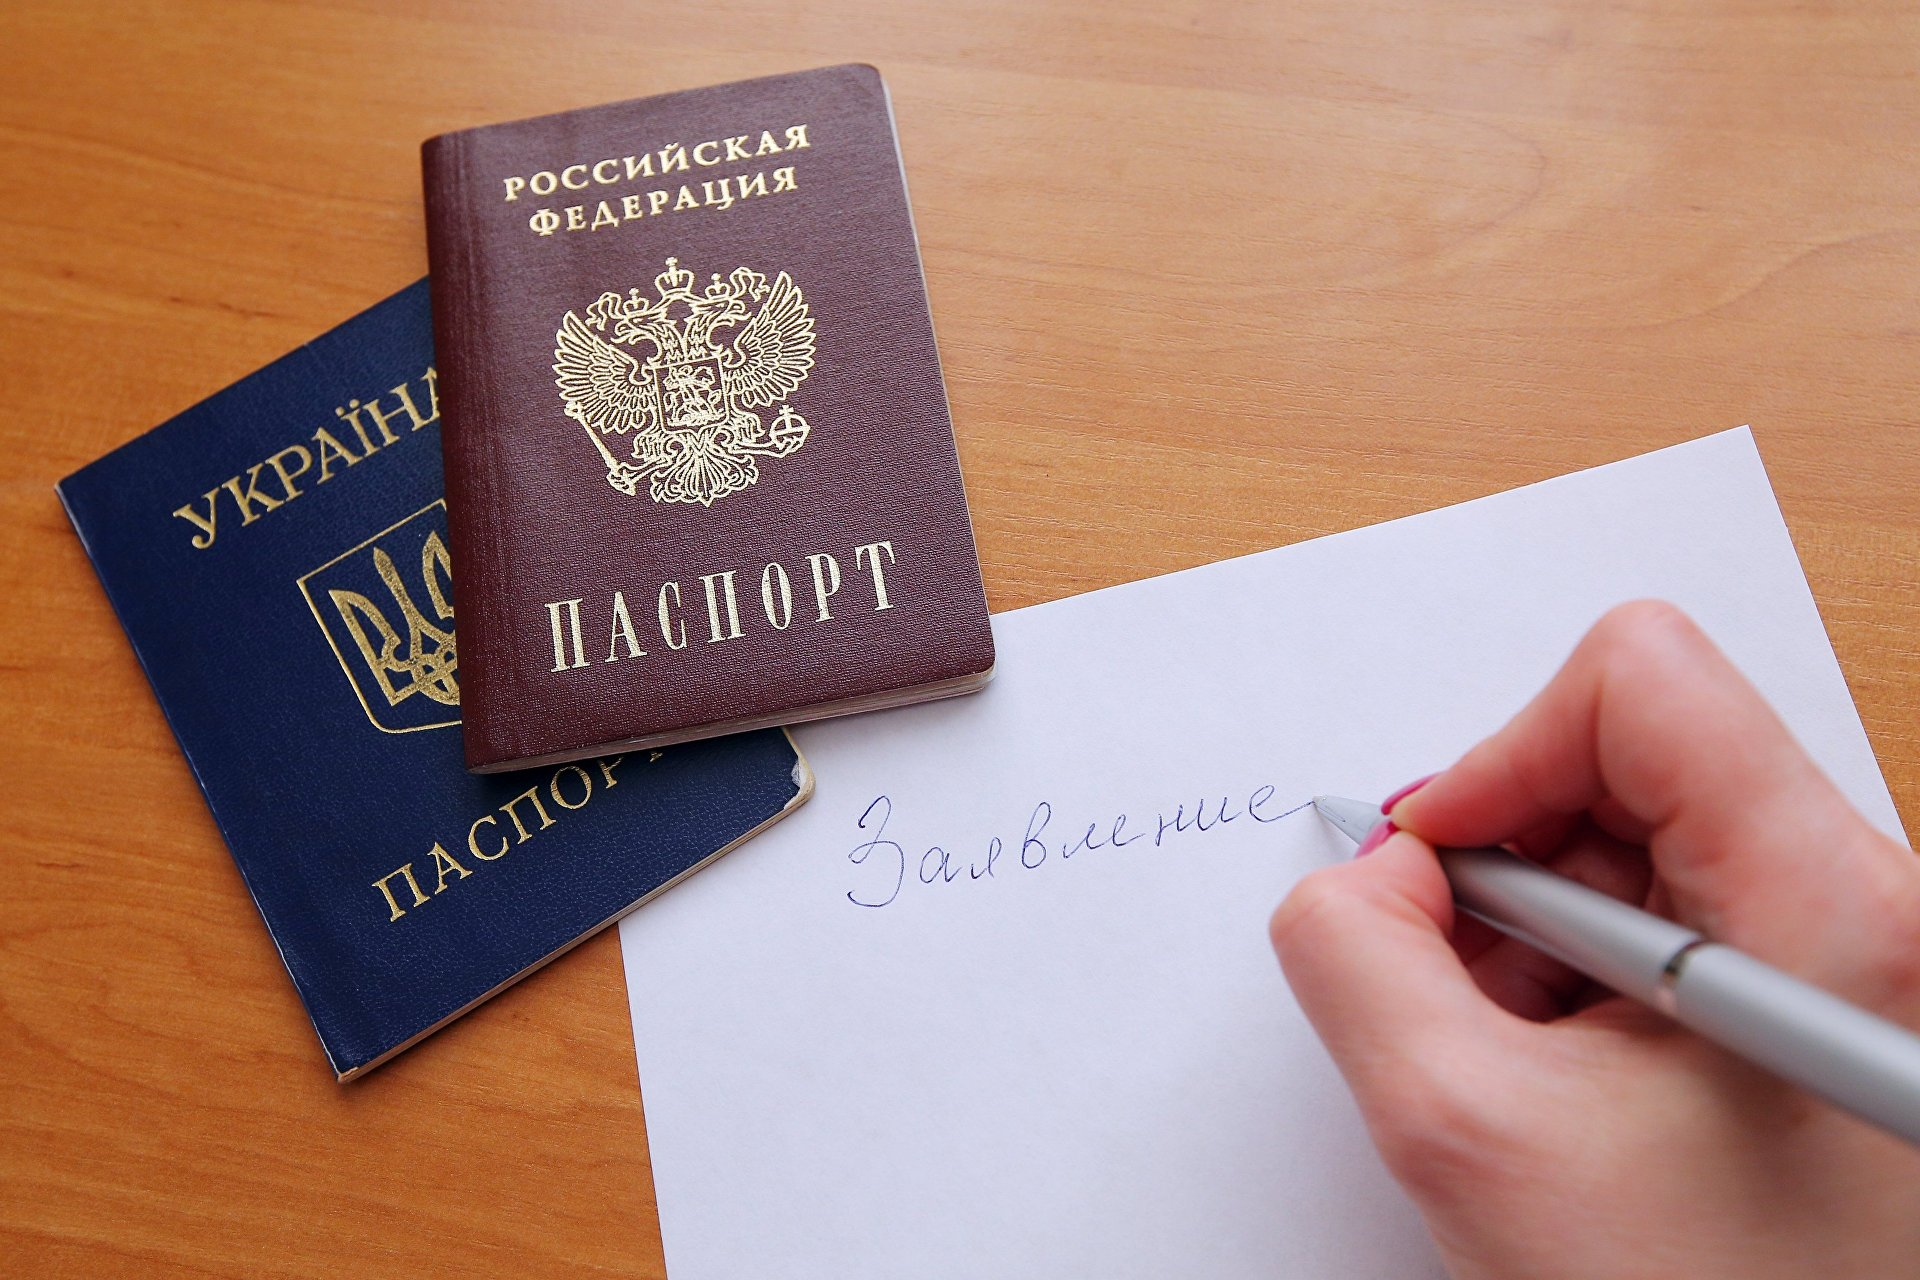 В ЕС задумались о запрете въезда украинцам с паспортами РФ,  – СМИ